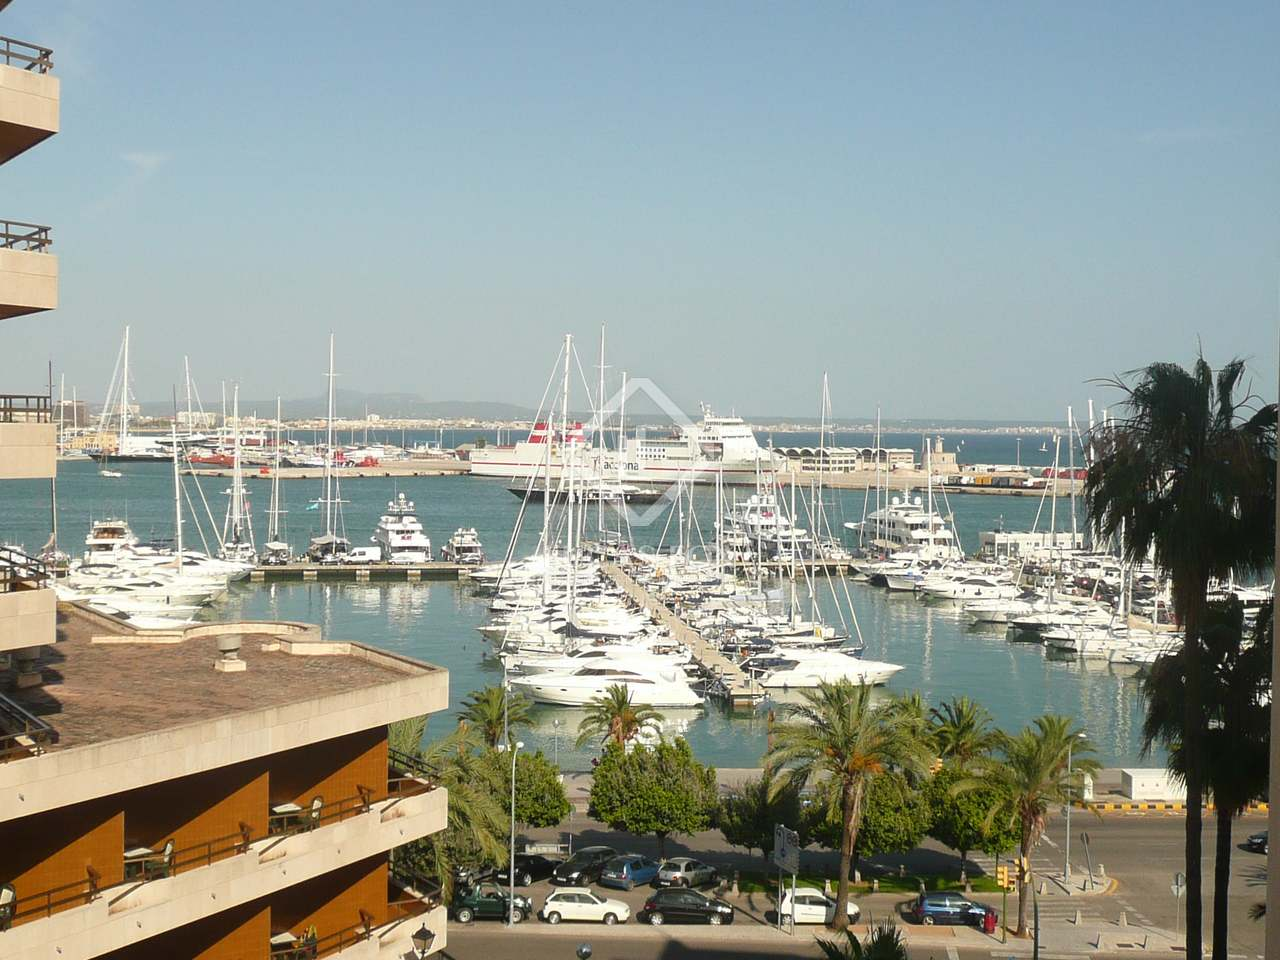 Propiedad frente al mar en venta en palma mallorca - Casas para alquilar en mallorca ...